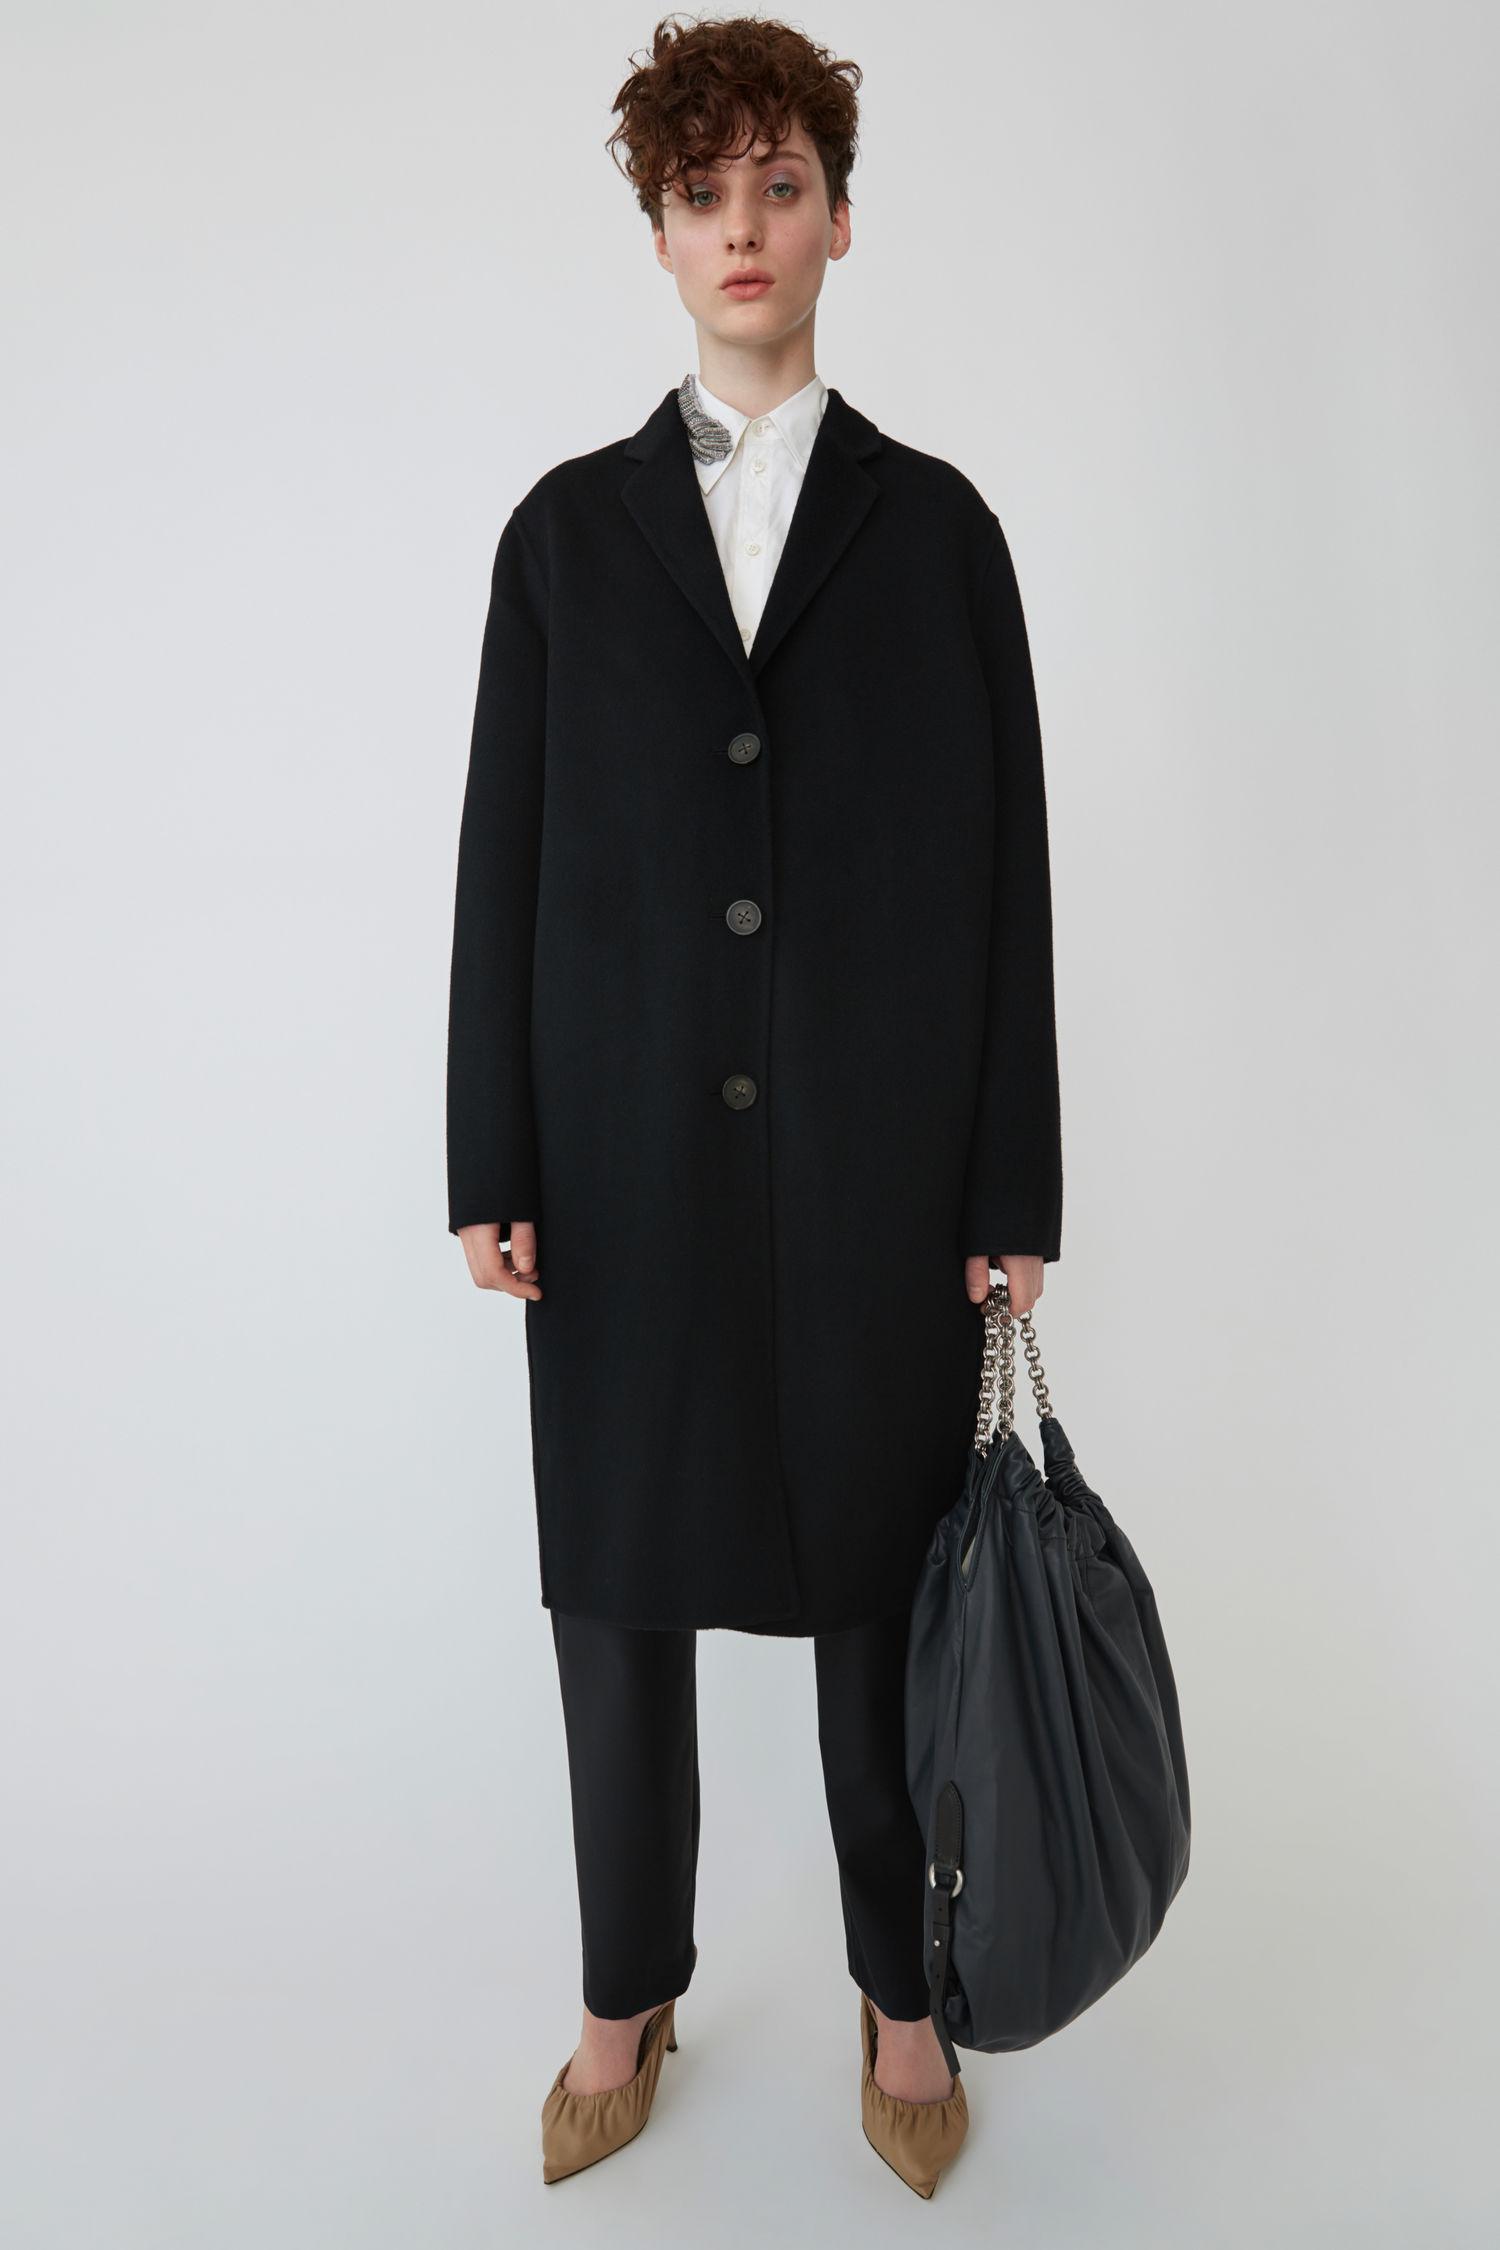 Masculine Tailored Long Coat Black